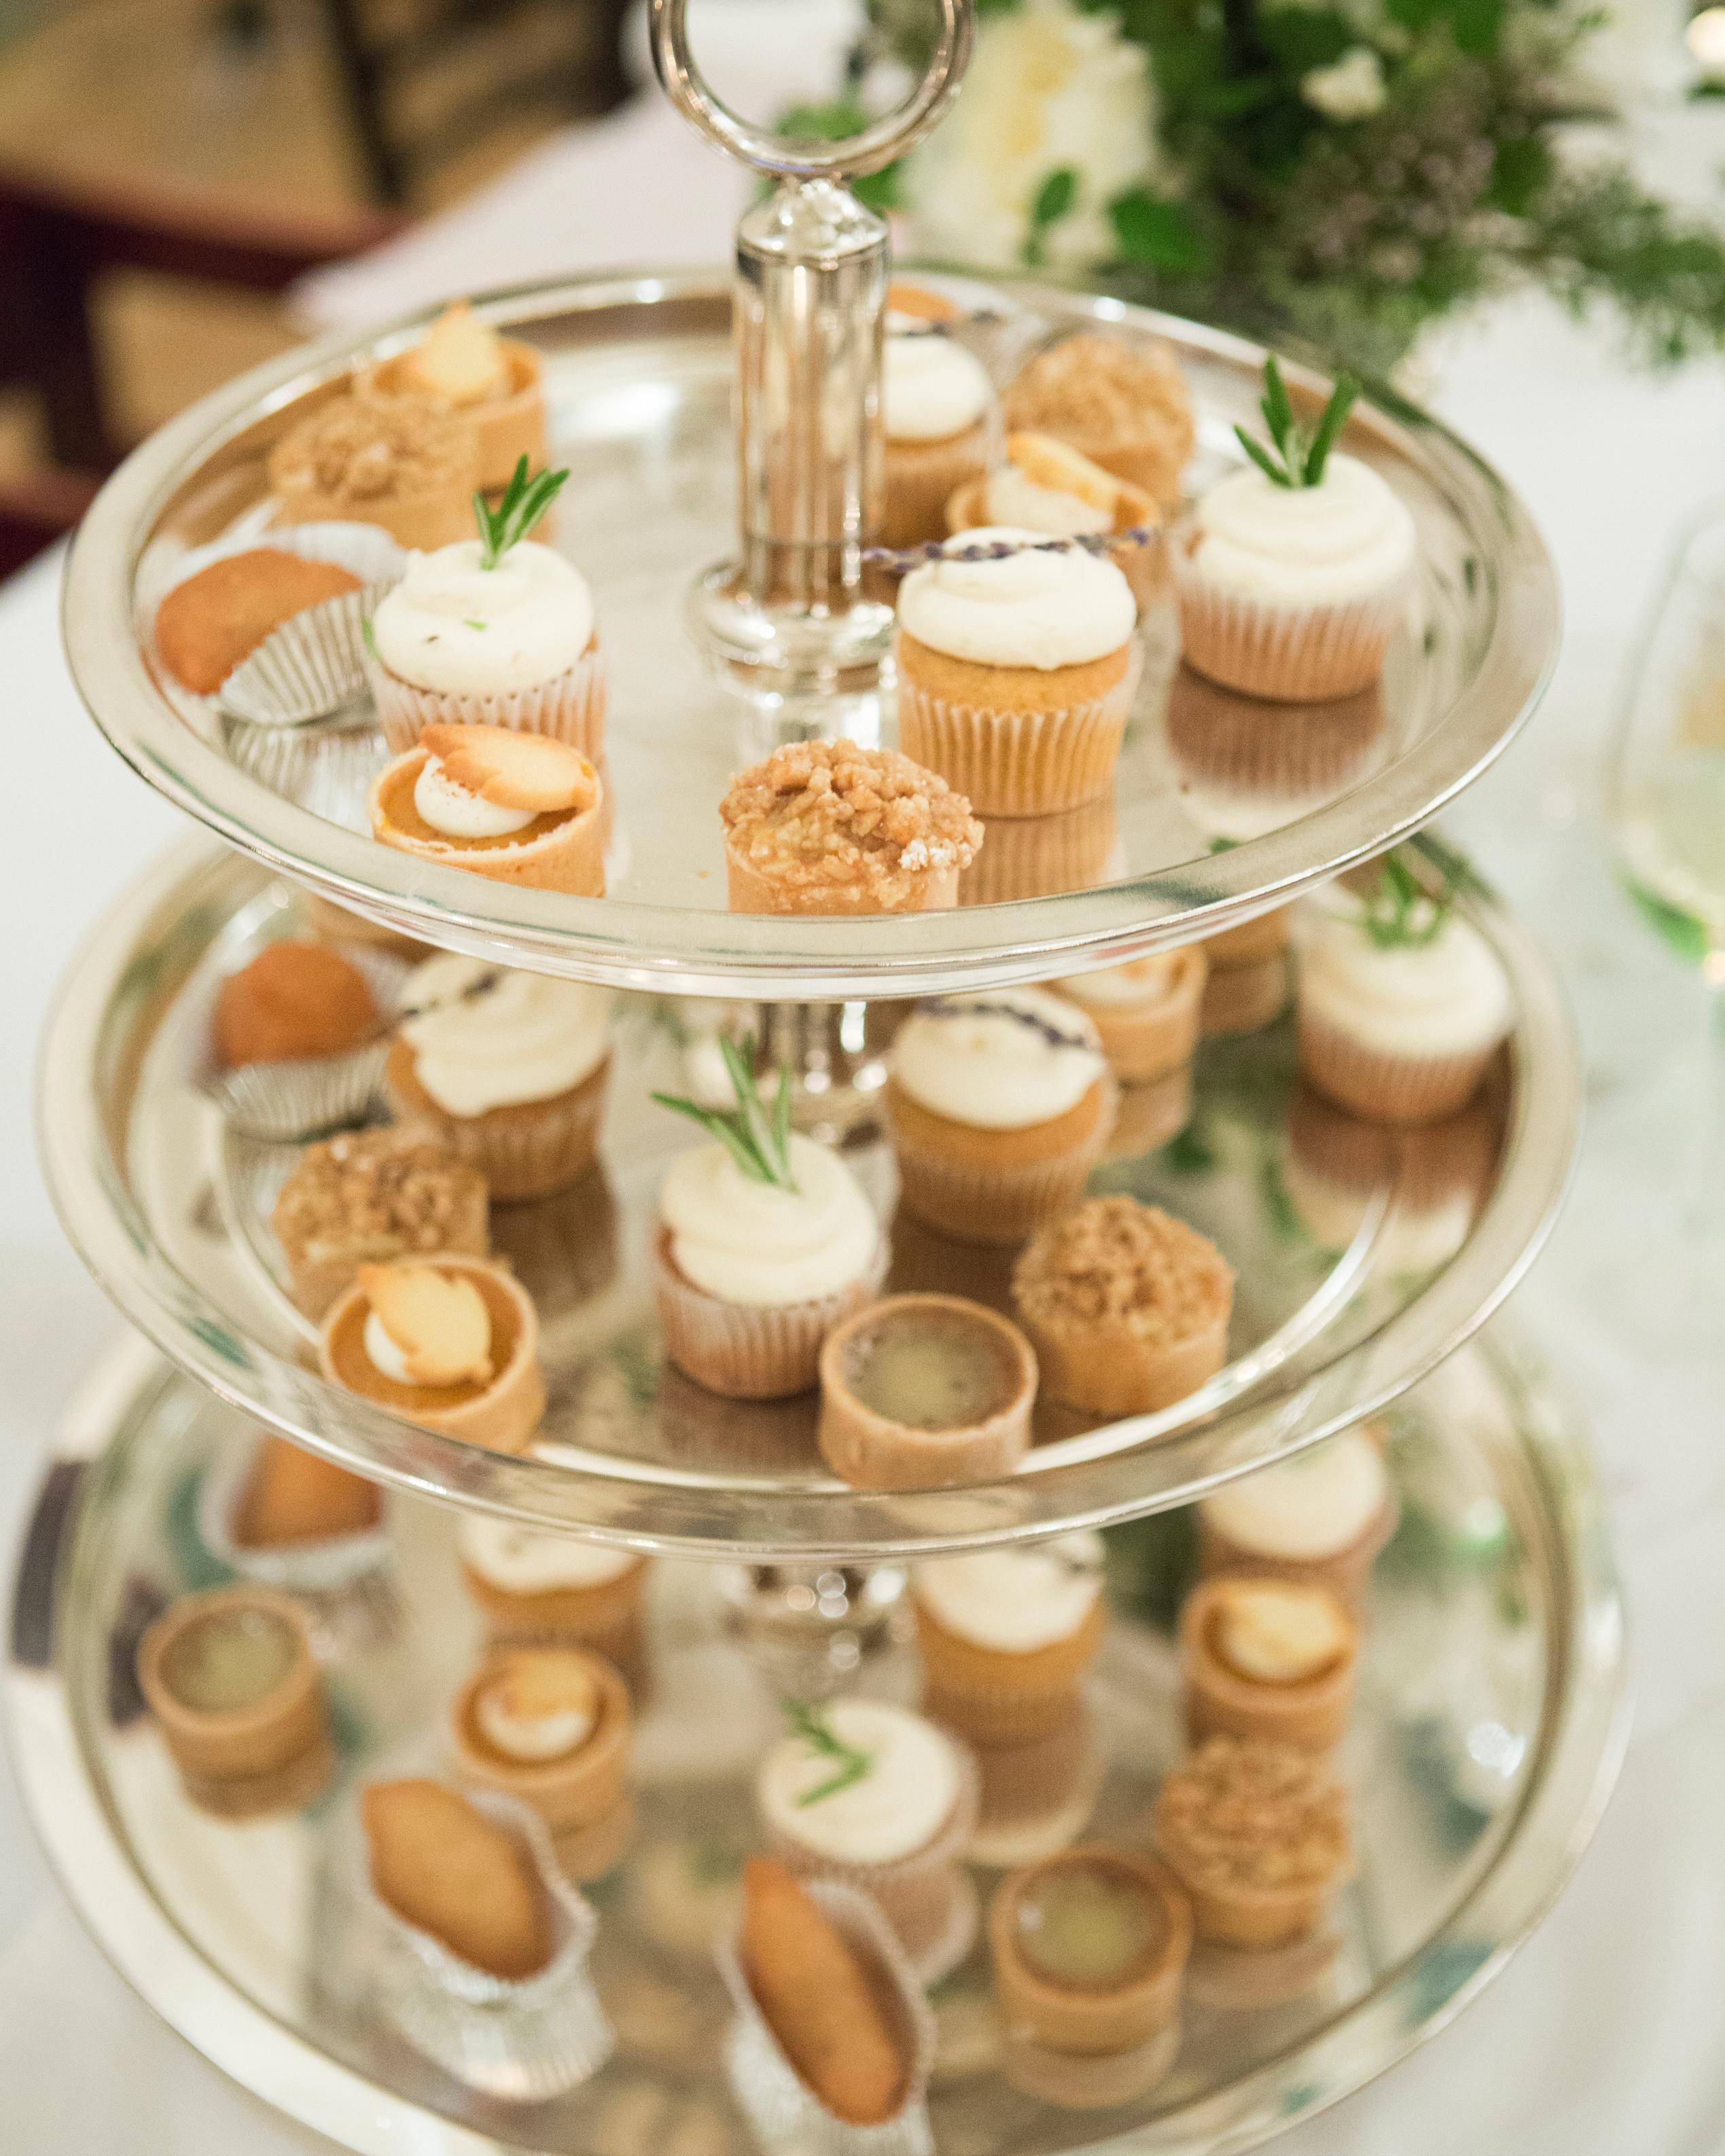 trish-alan-wedding-desserts-083-s111348-0714.jpg